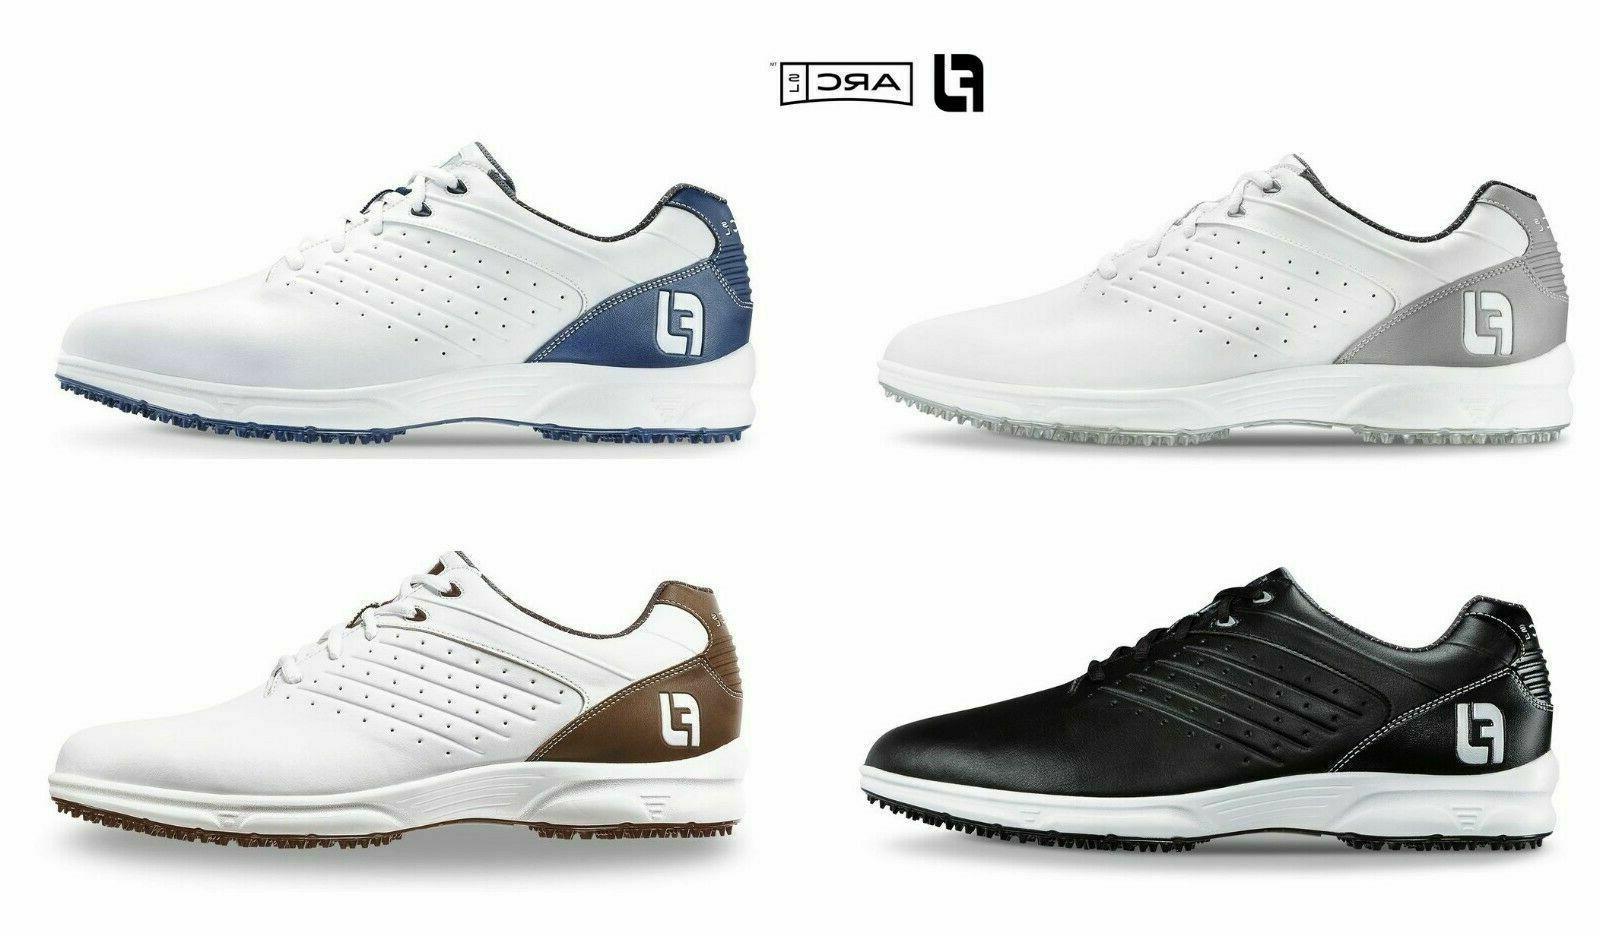 arc sl spikeless golf shoes nib choose